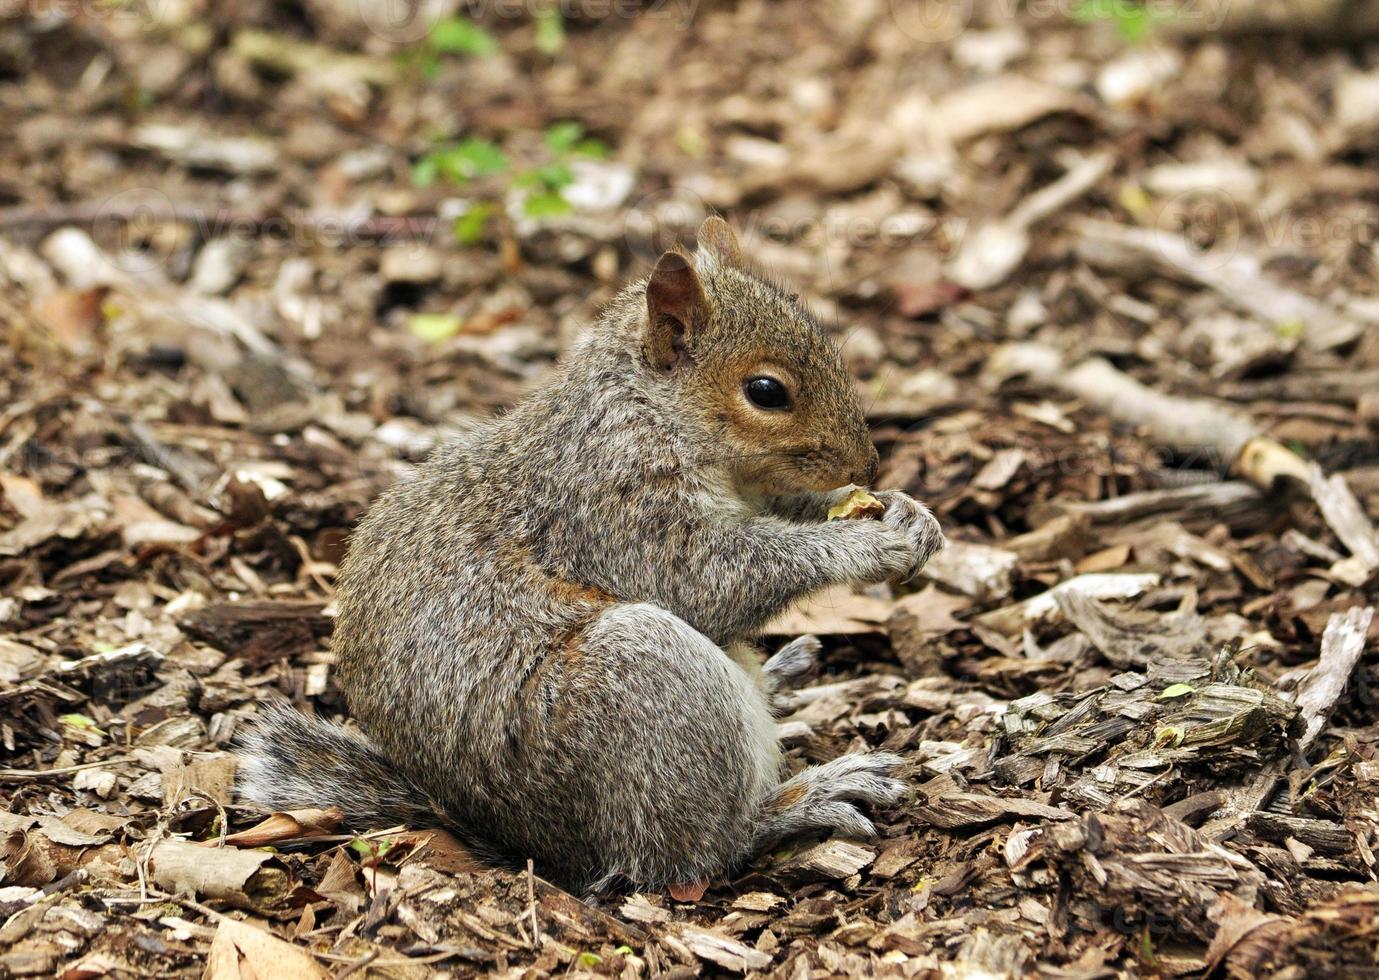 lunch met eekhoorns in Central Park New York City, VS. foto